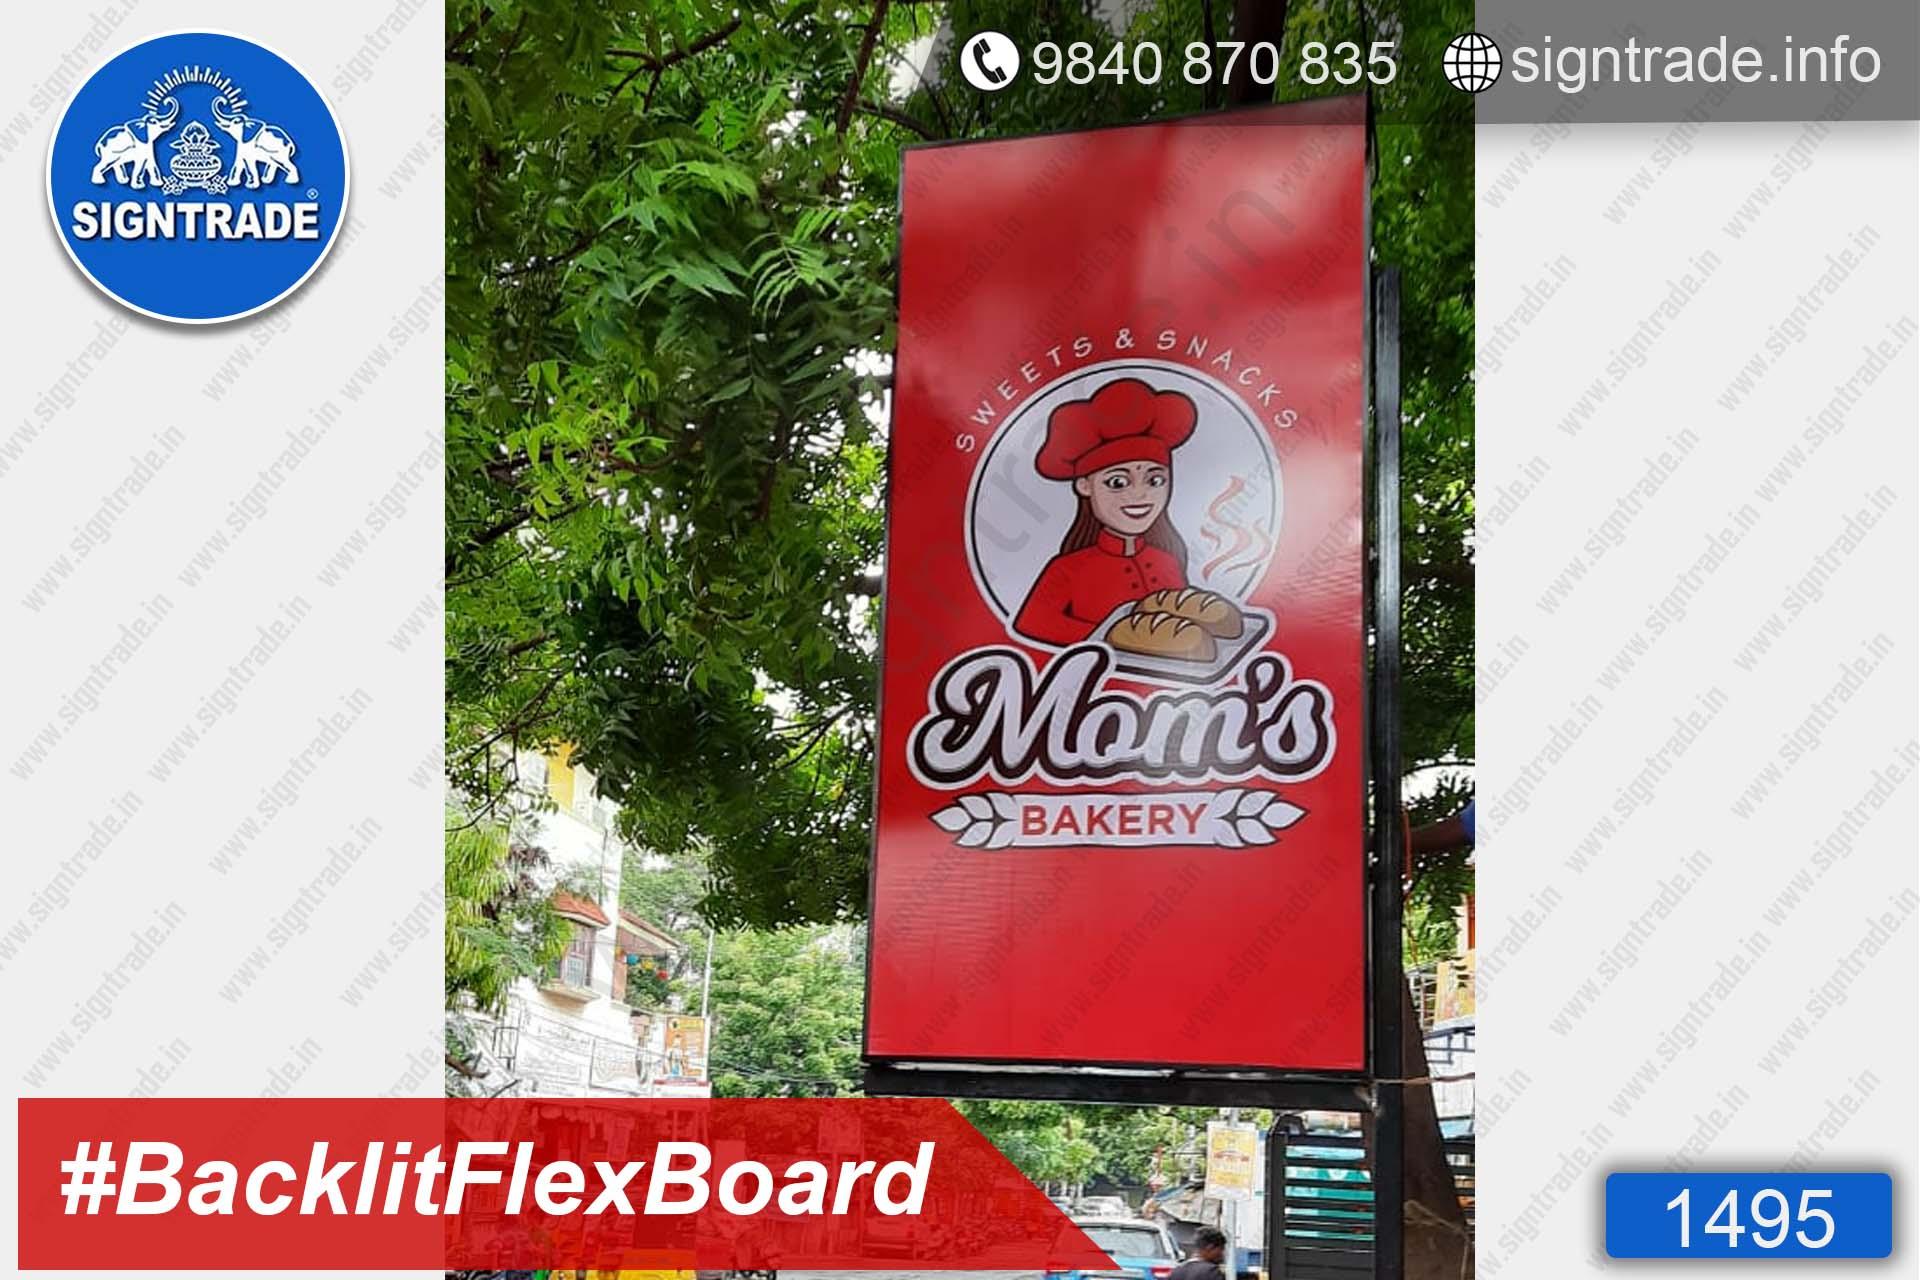 1495, Mom's Bakery, Chennai - SIGNTRADE - Digital Printing Service, BackLit Flex Board Manufacturers in Chennai